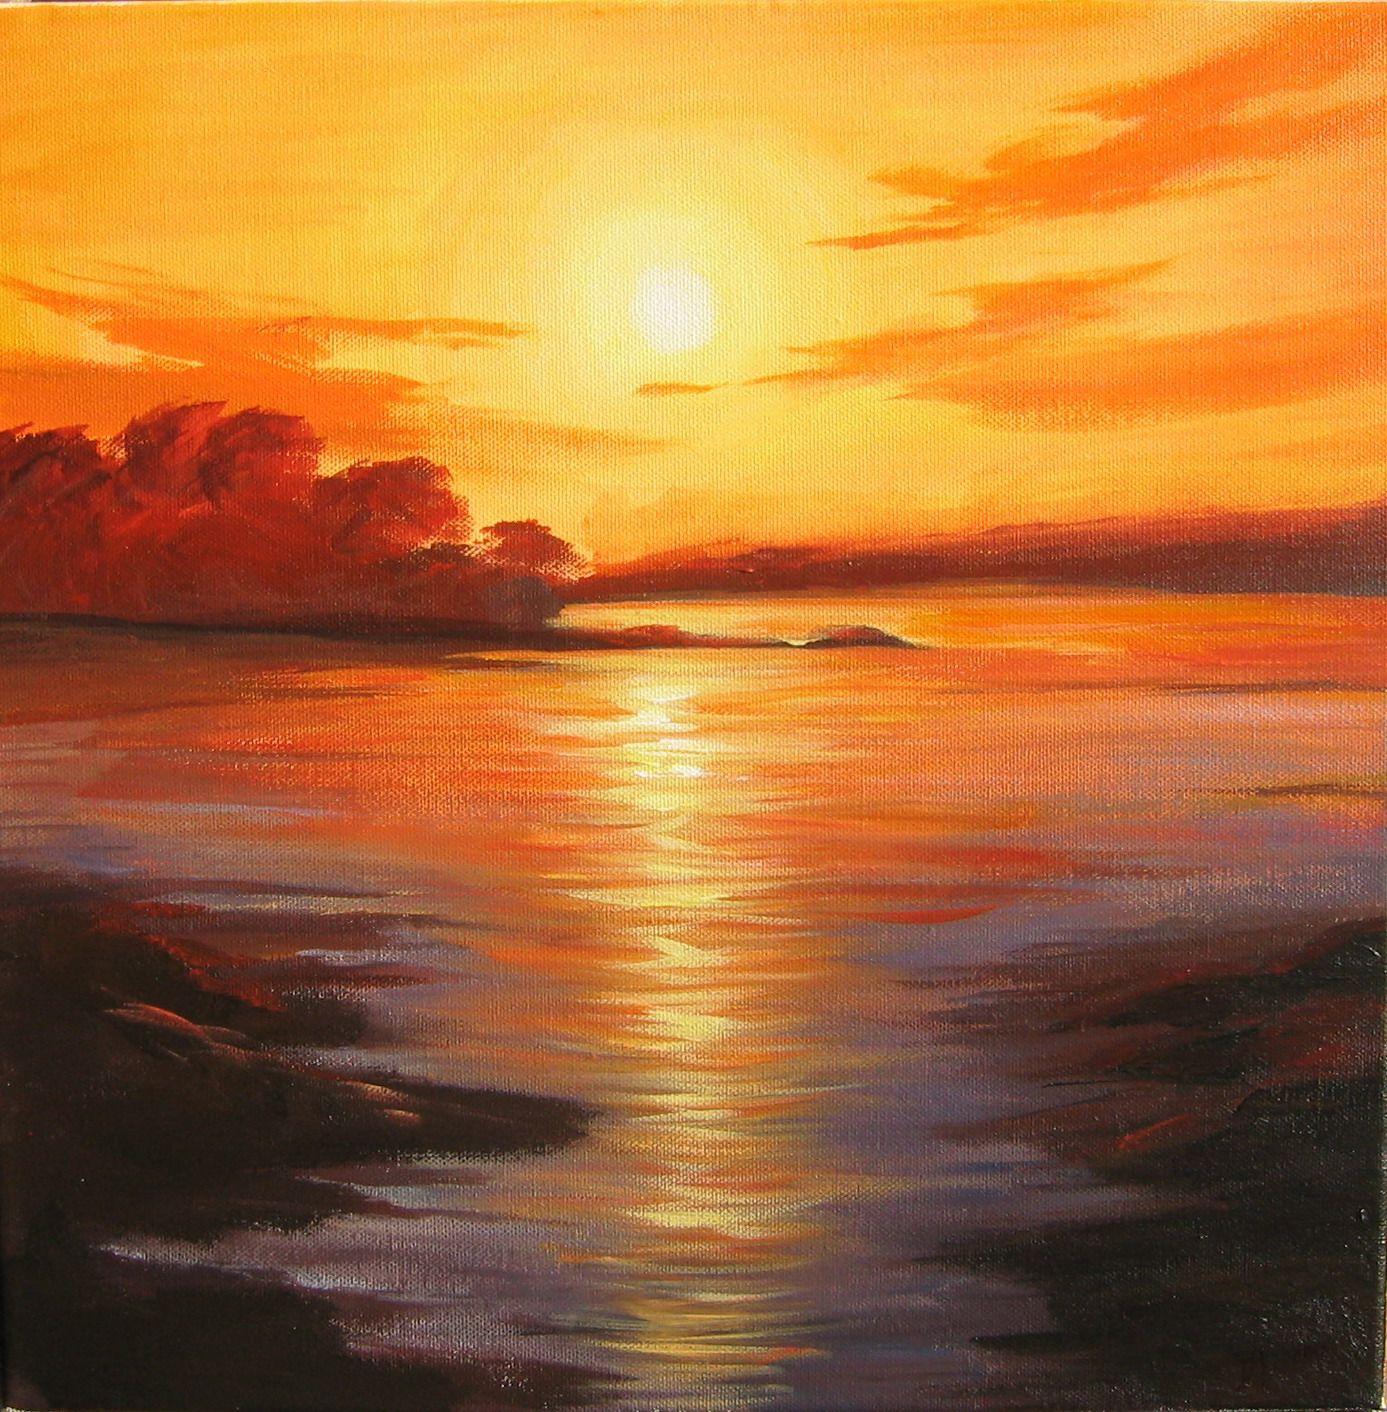 Watercolor Sunrise Sunrise Painting By Manzara Resimleri Resim